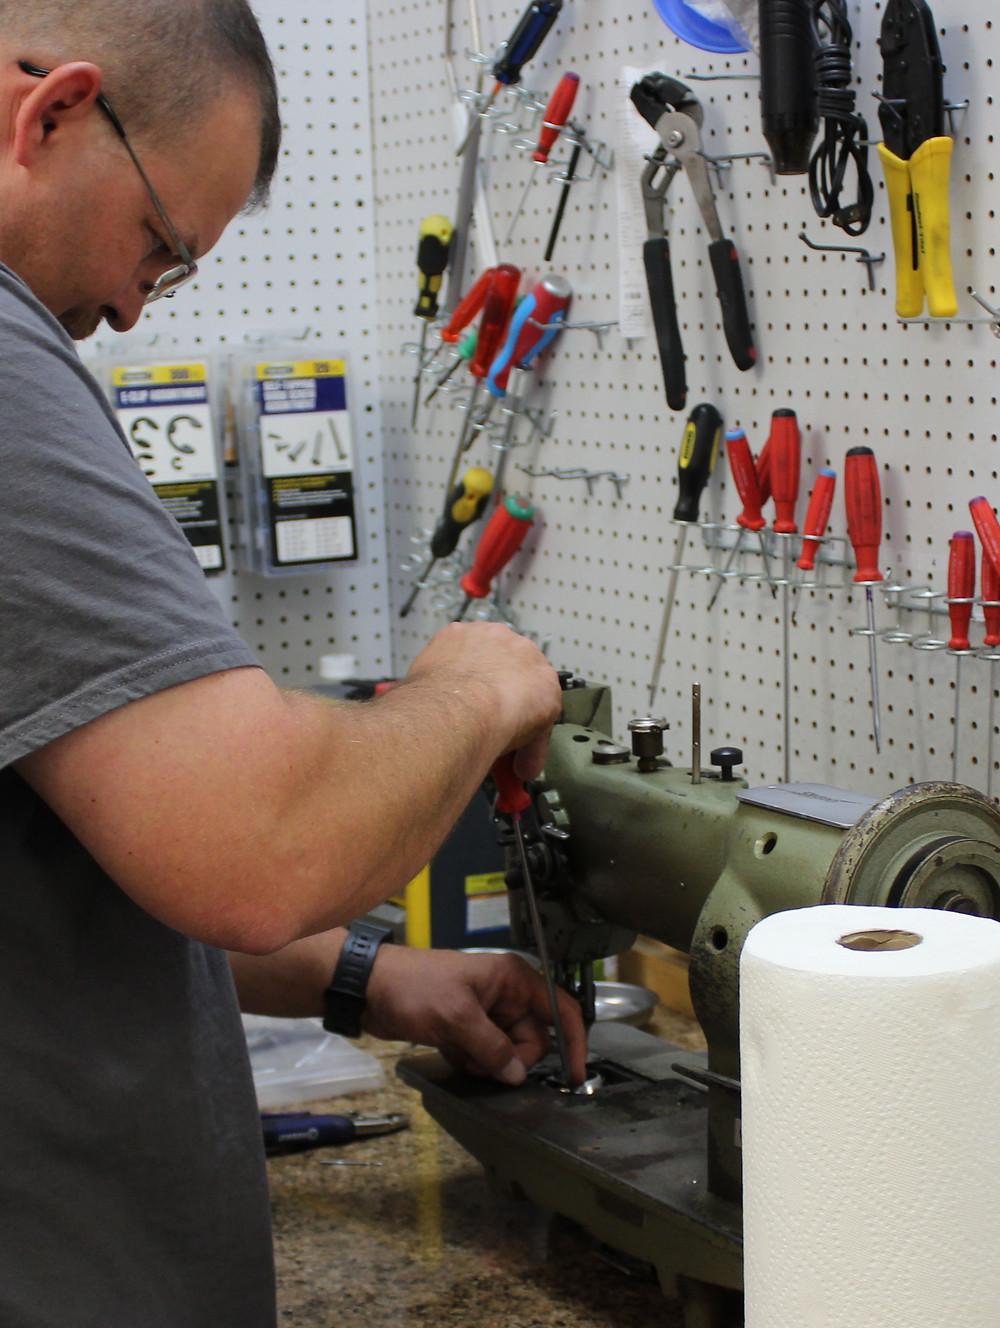 Greg Repairs an industrial machine.